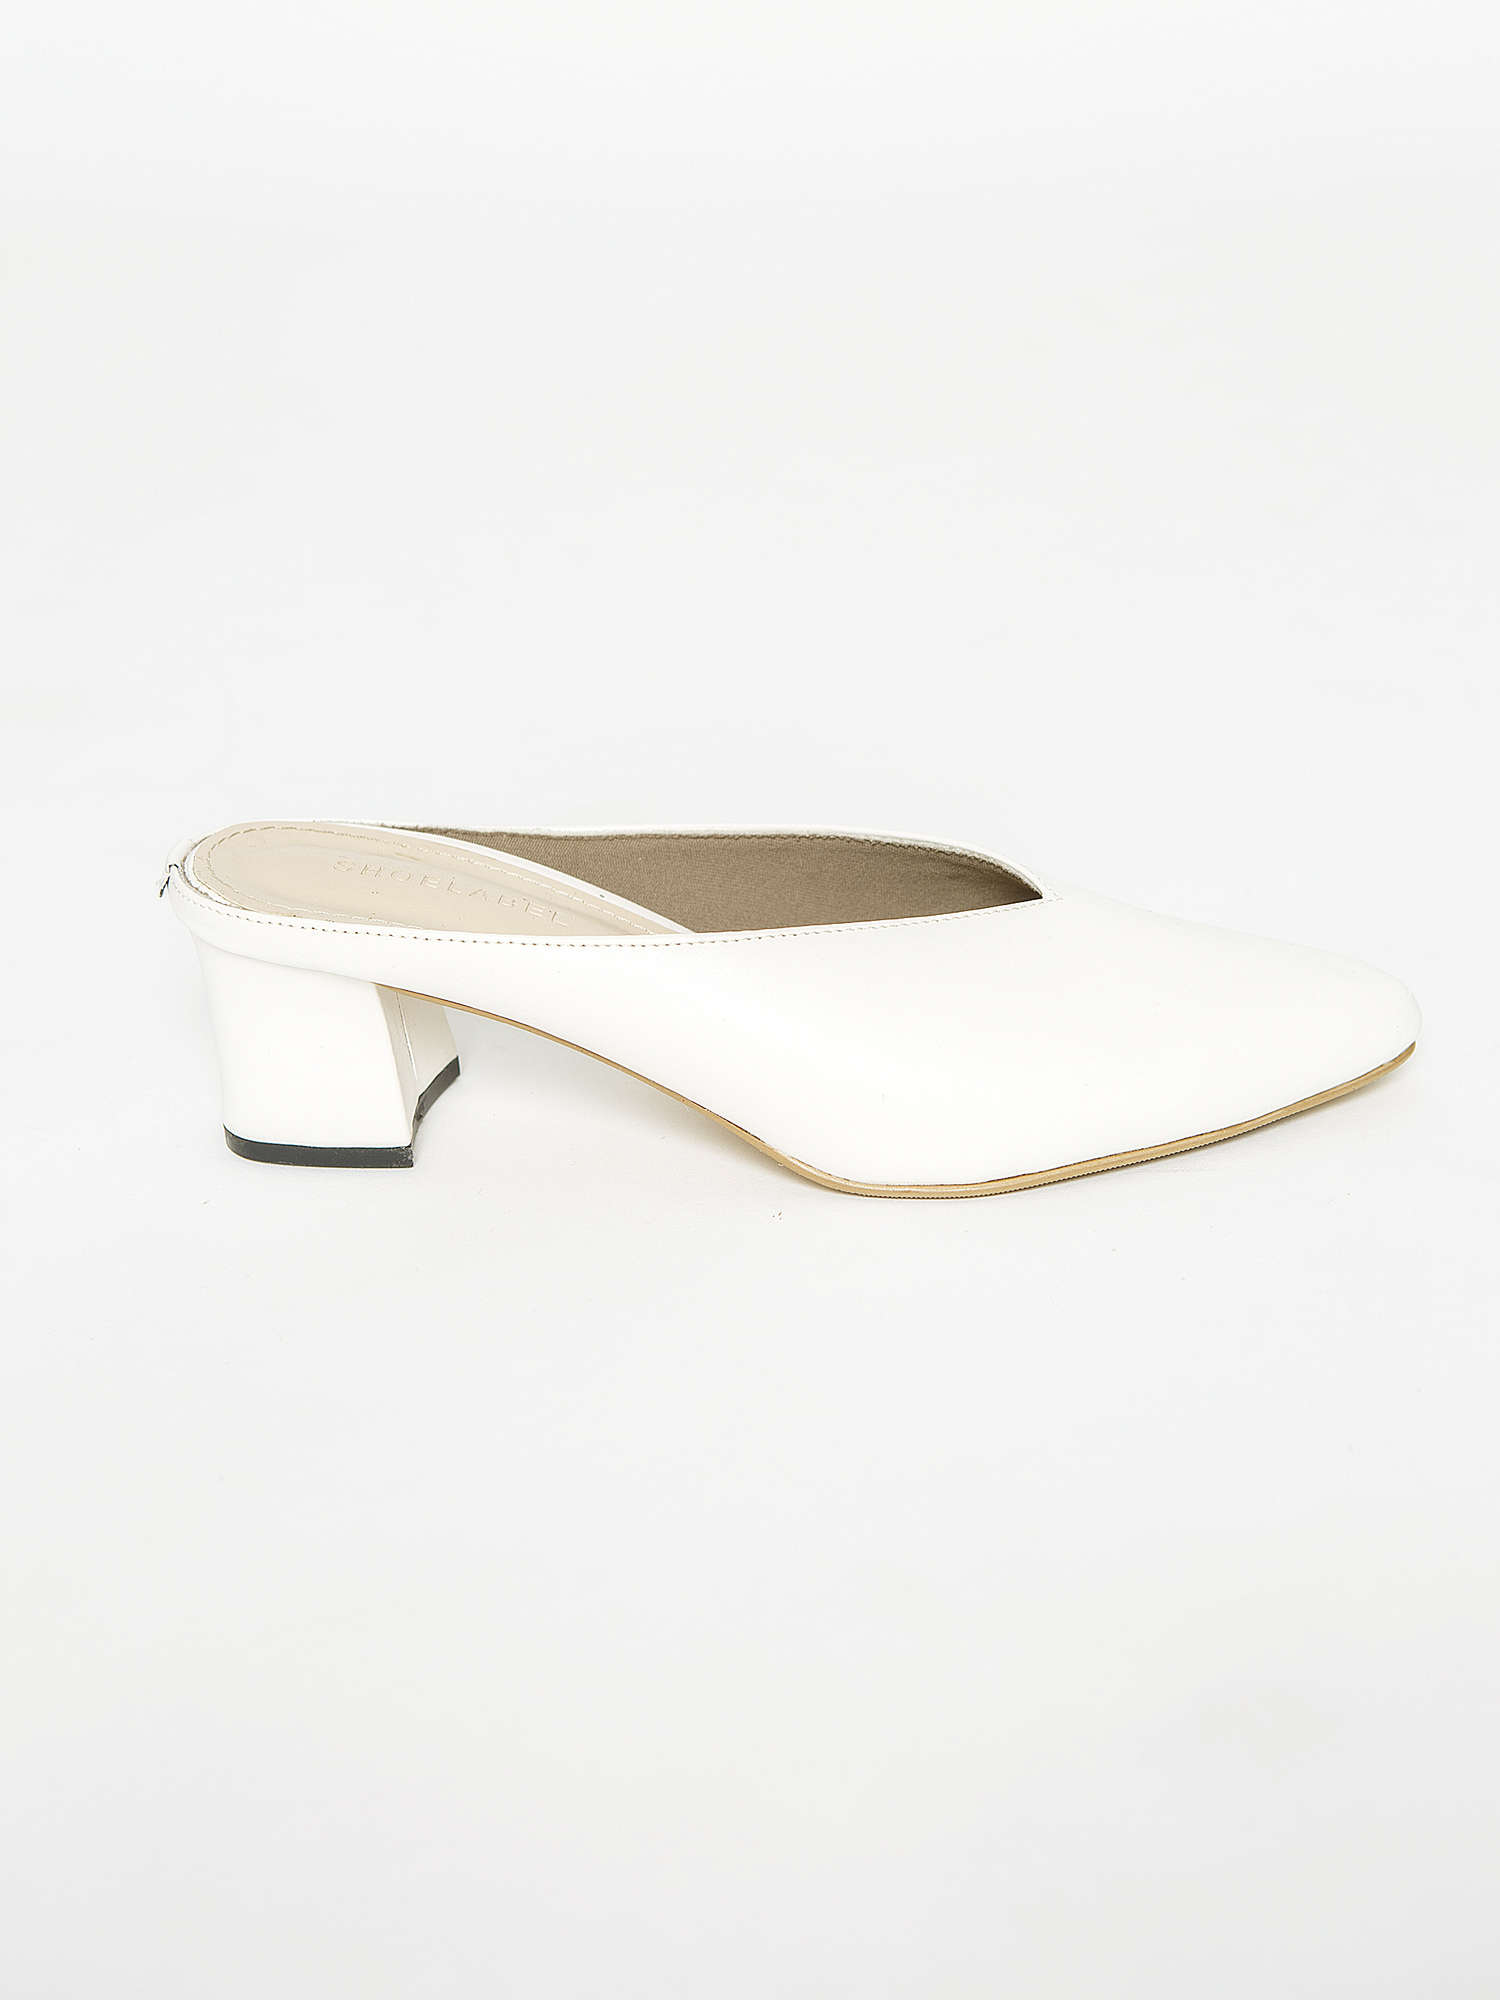 #PopbelaOOTD: 5 Rekomendasi Heels Dibawah 400 Ribu